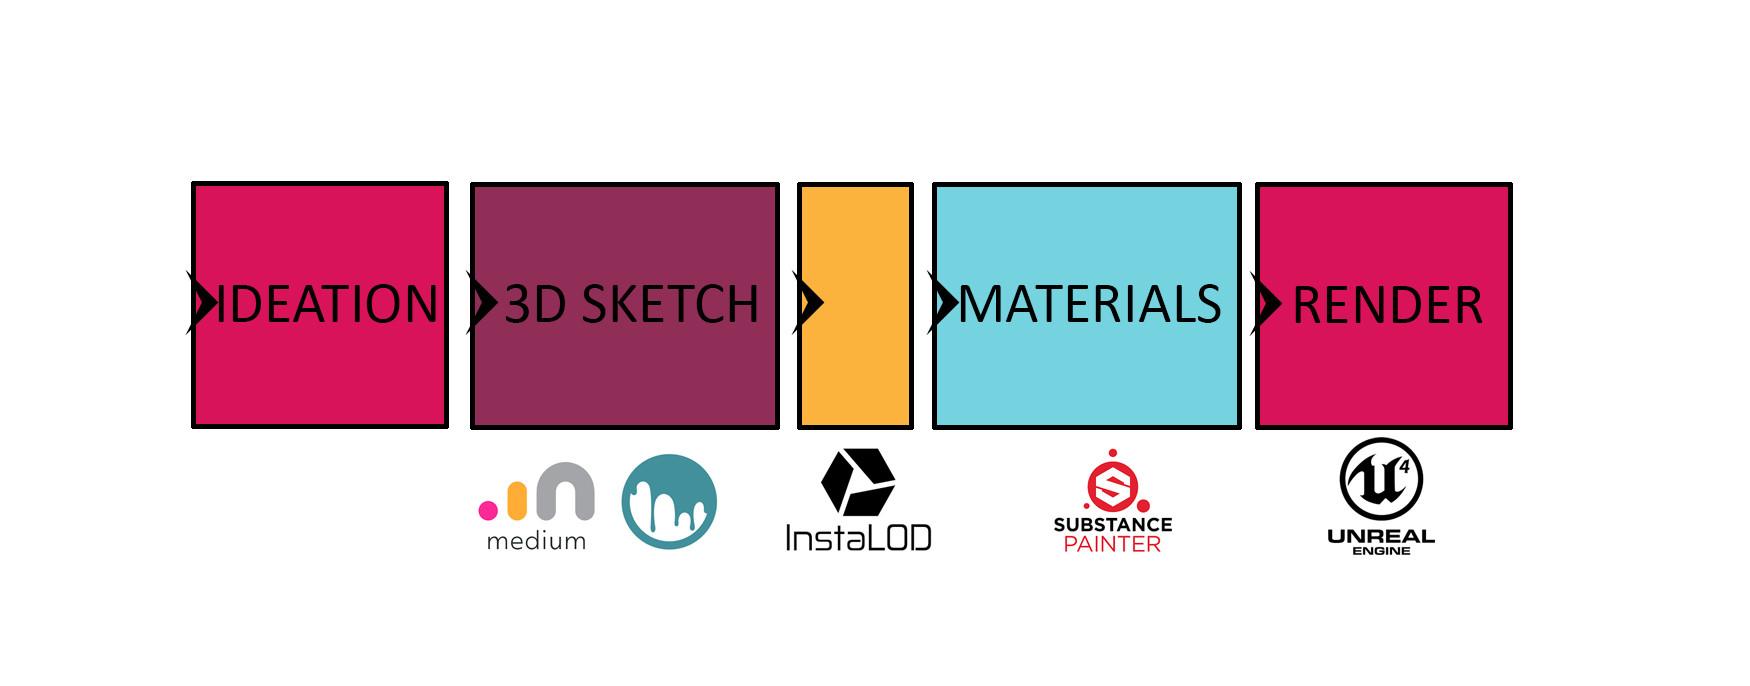 ArtStation - Jay Evans - InstaLOD for 3d Concepting  From